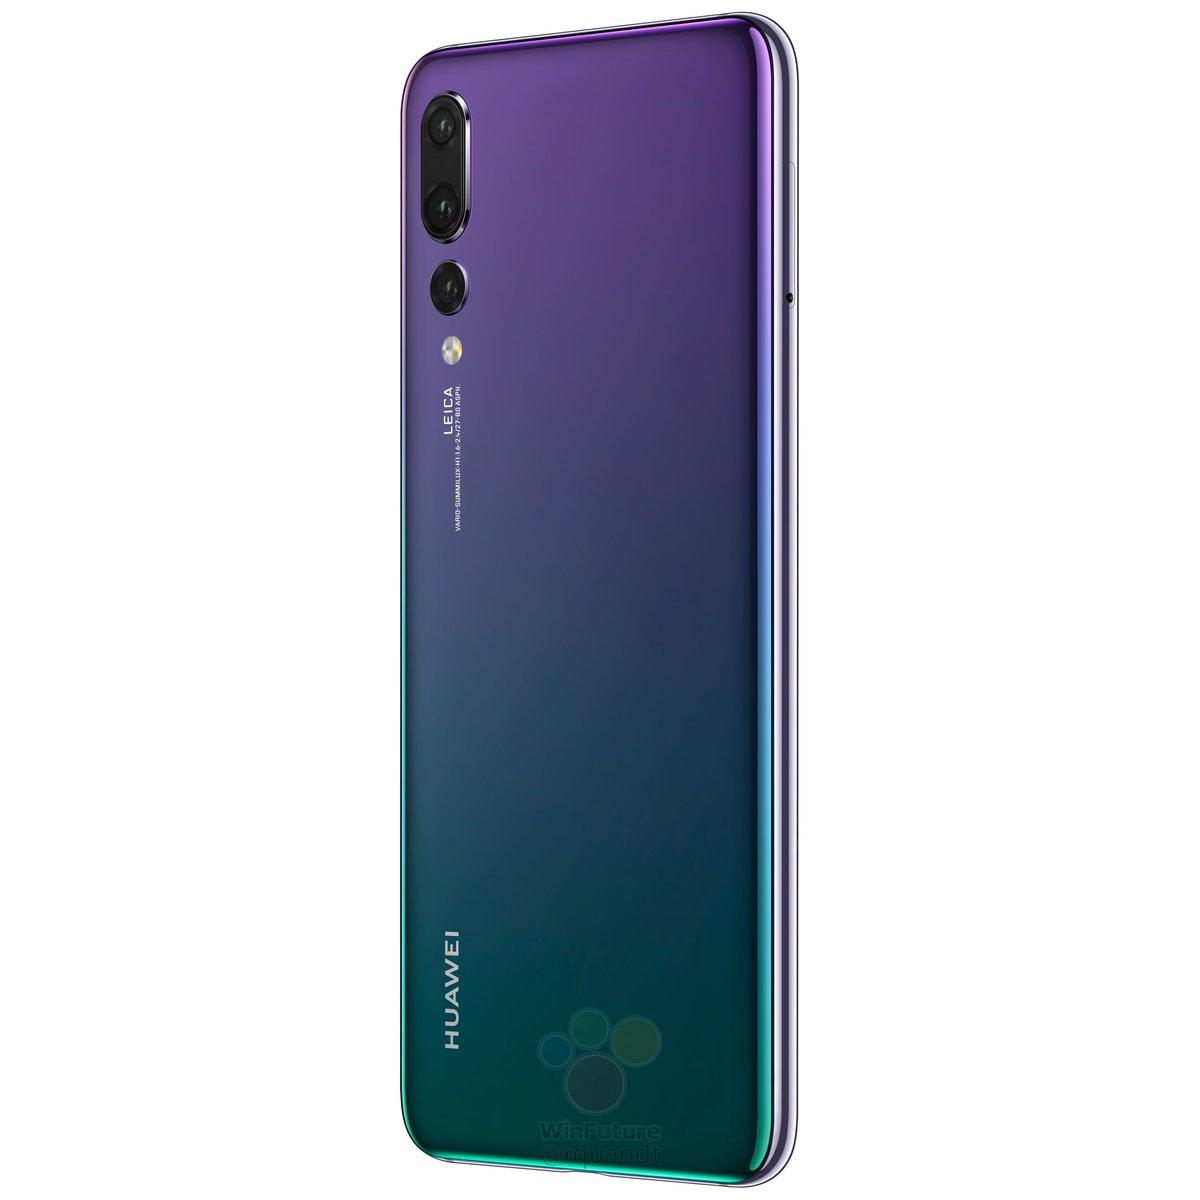 Huawei-P20-Pro-13